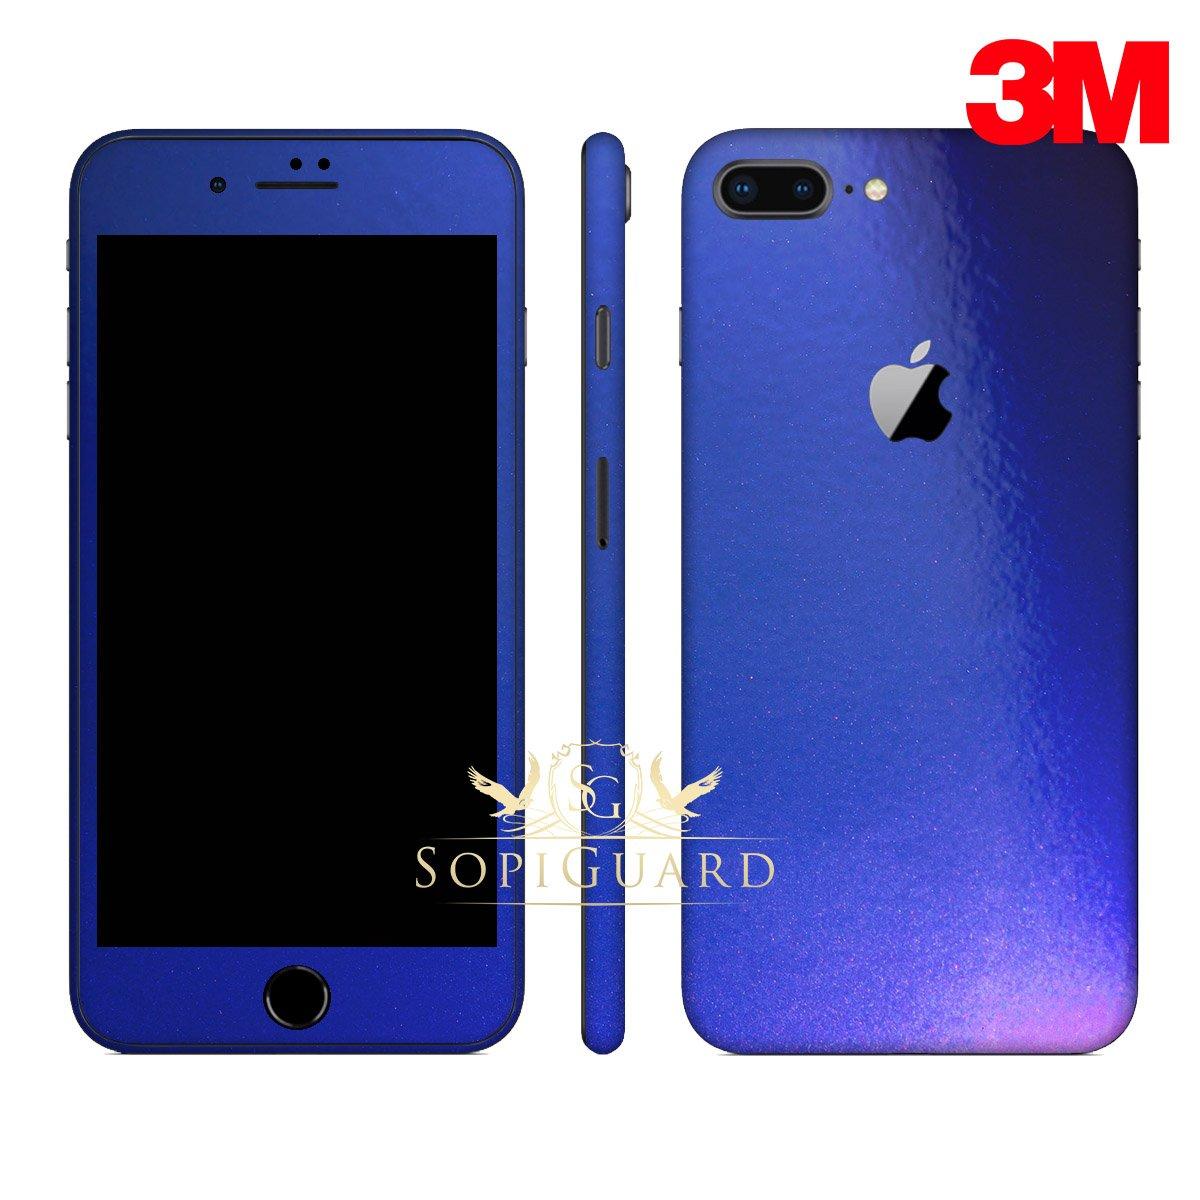 SopiGuard Iphone 8 plusカーボンファイバーフルボディPrecision edge-to-edge coverage easy-to-applyビニールスキンステッカー B075WTKHLT 3M Flip Electric Blue